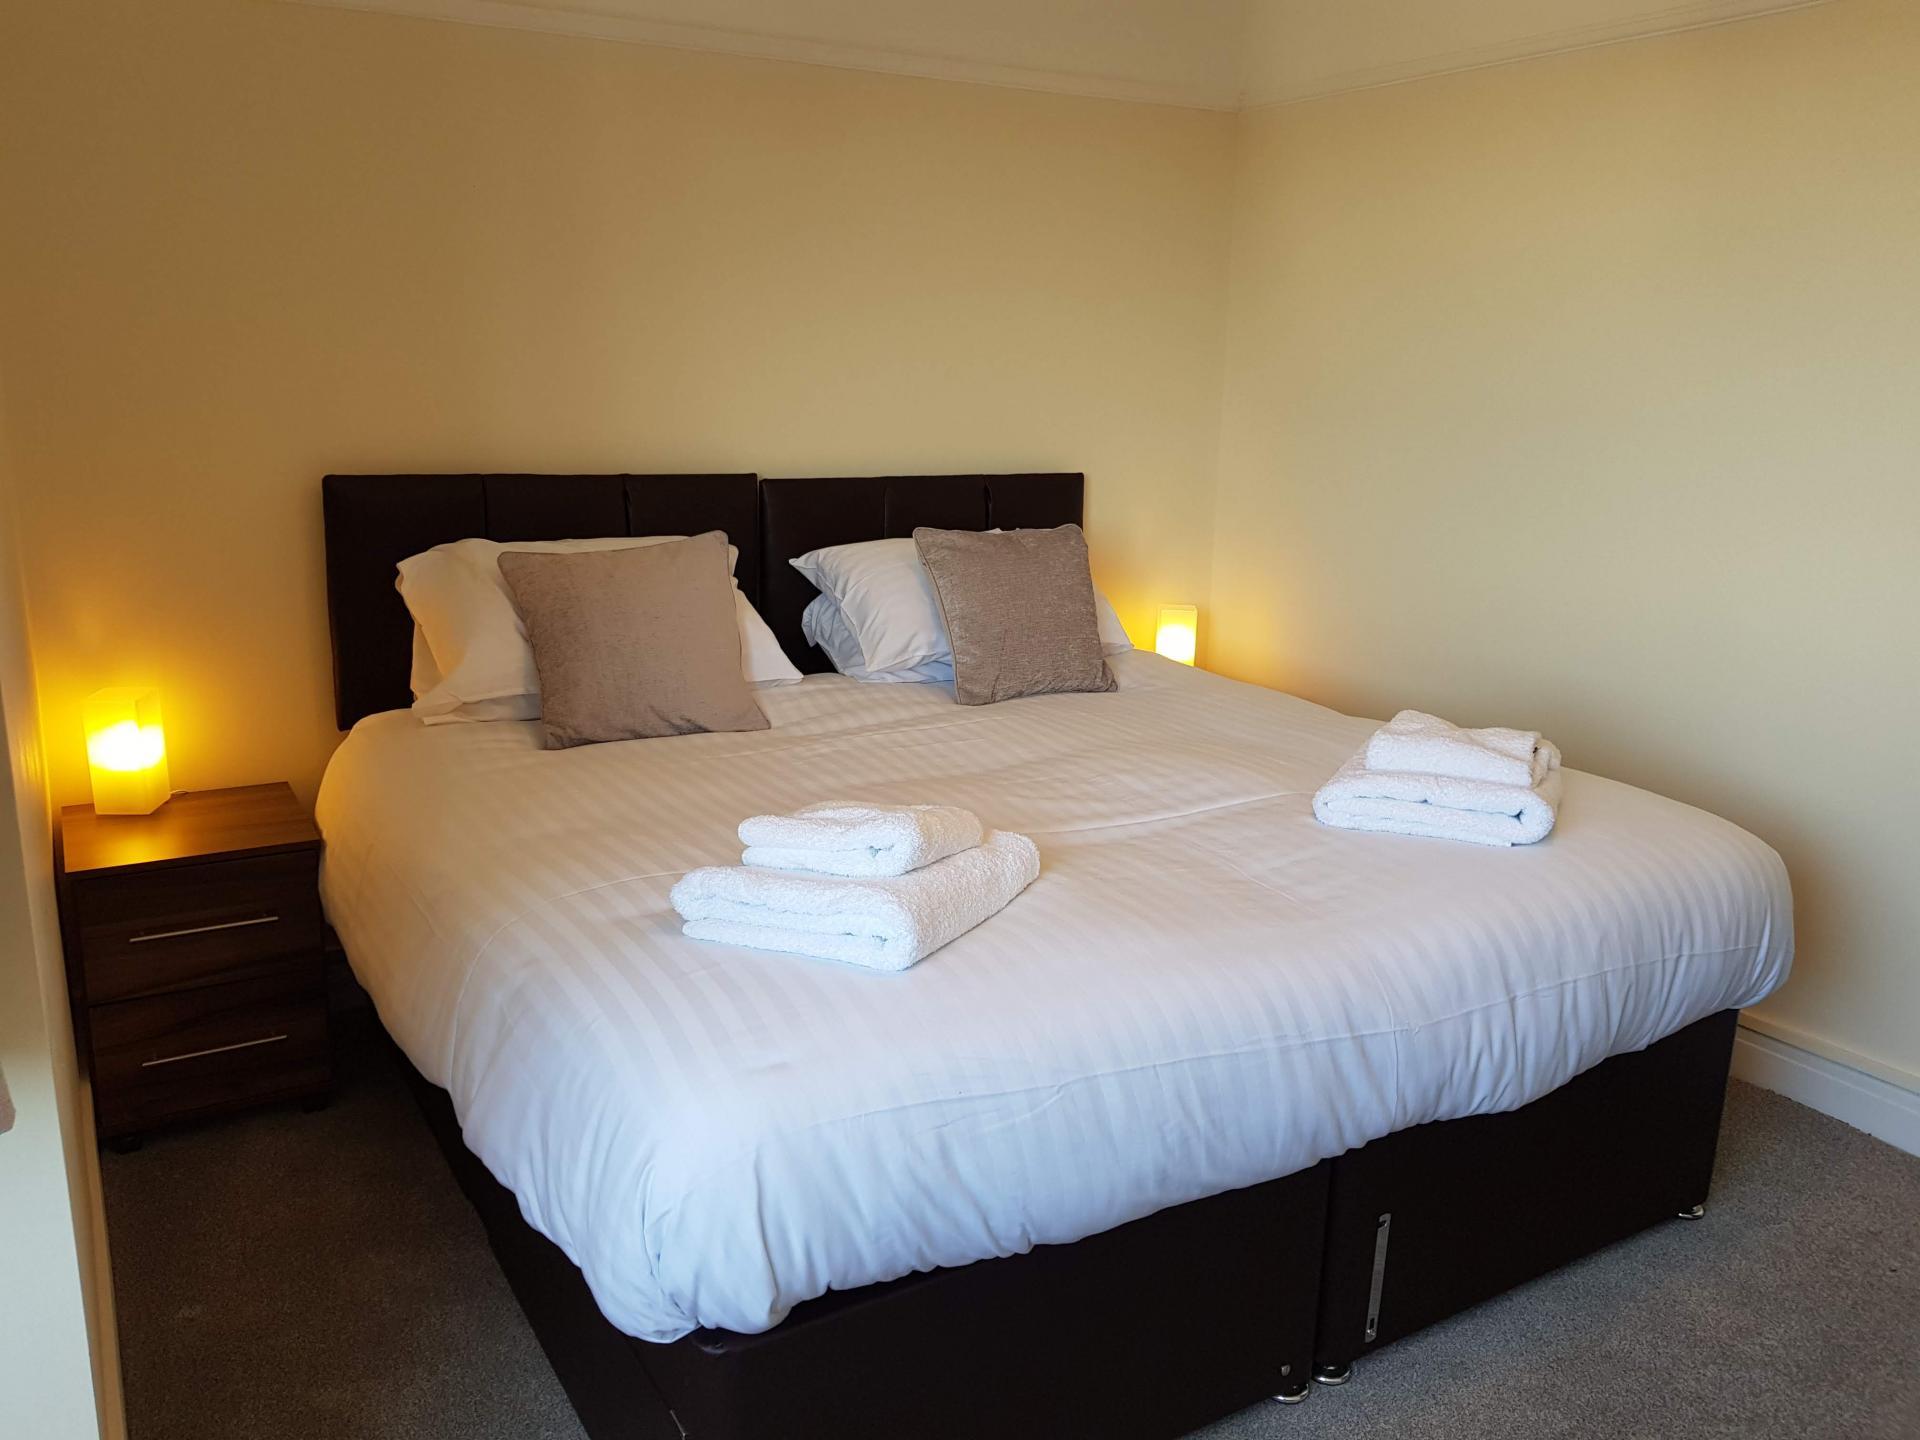 Cosy bedroom at Braganza House Apartments, Old Portsmouth, Portsmouth - Citybase Apartments